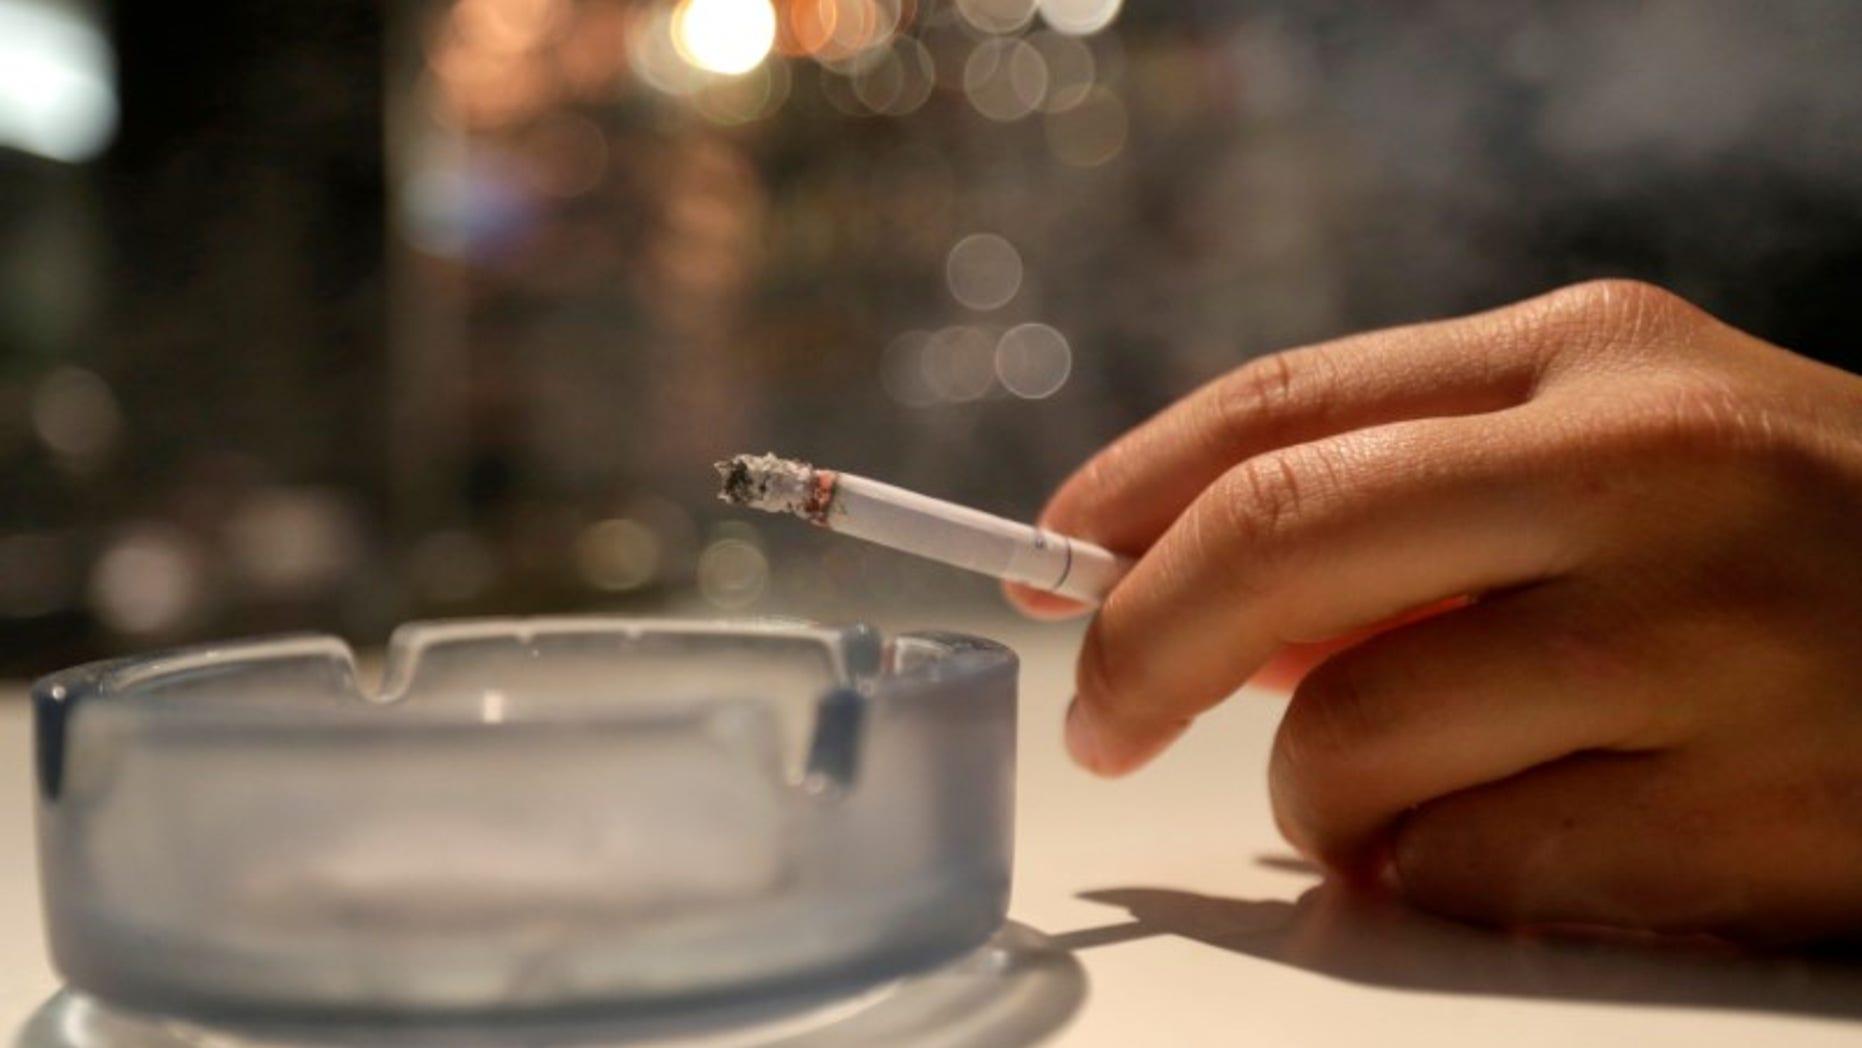 A customer smokes a cigarette in a cafe in Prague